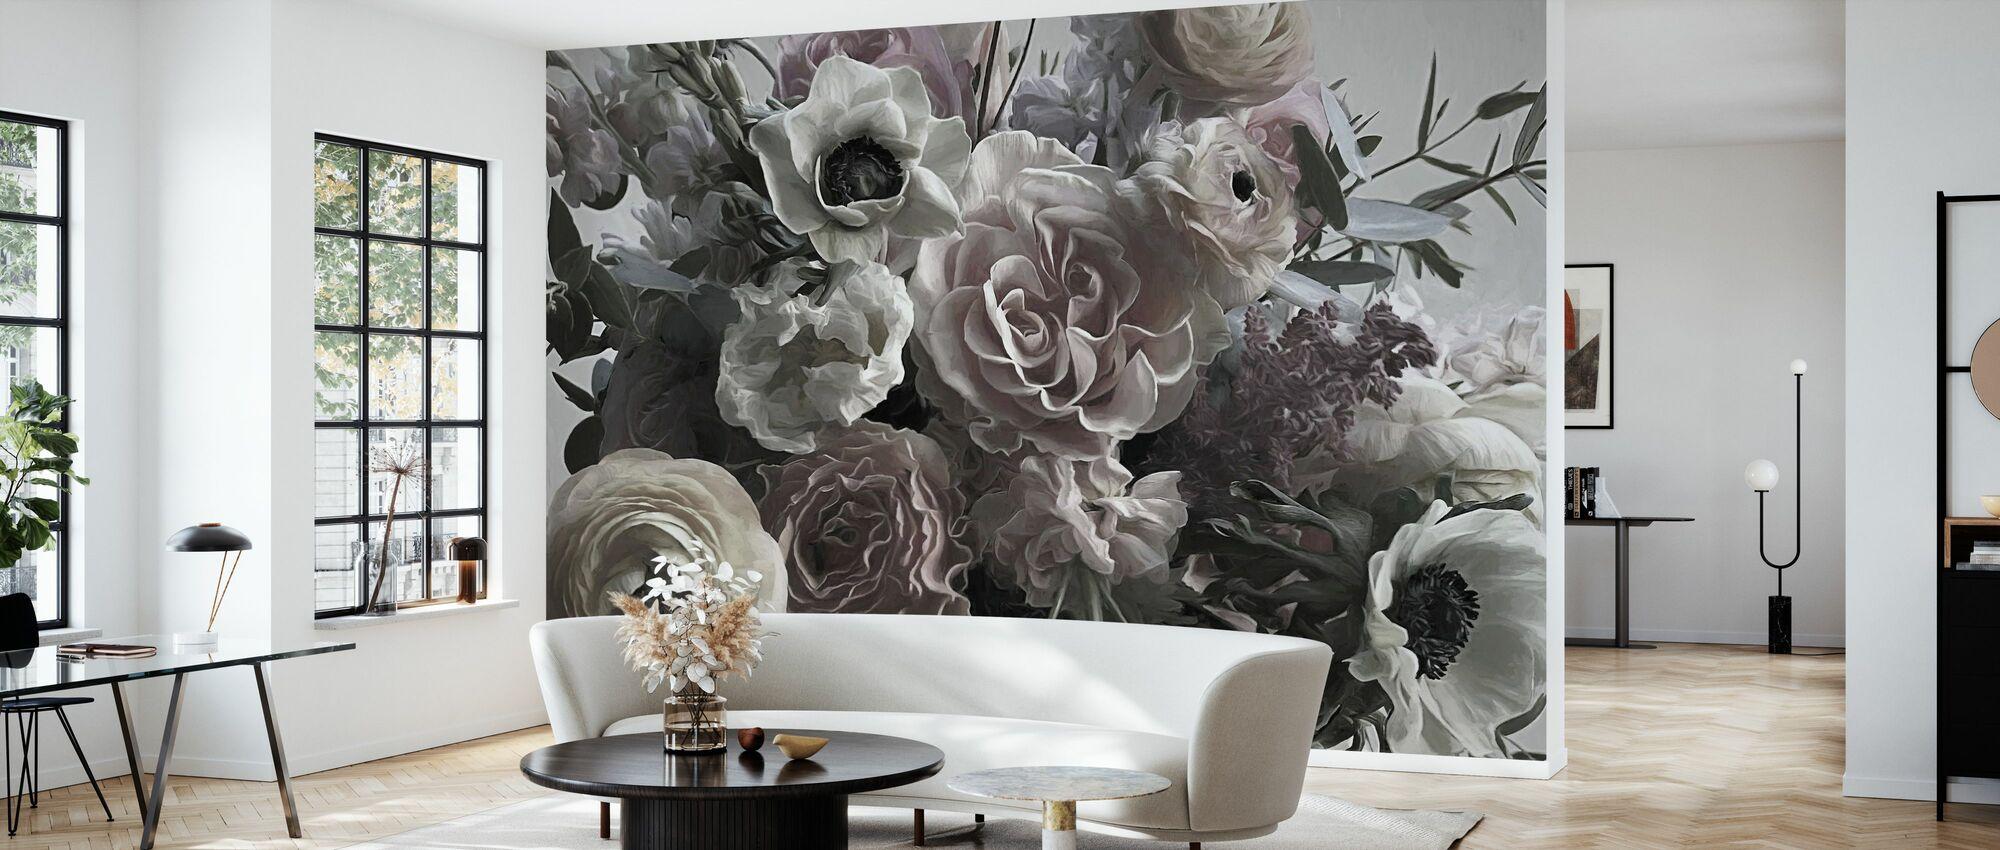 Ranuncullus - Wallpaper - Living Room